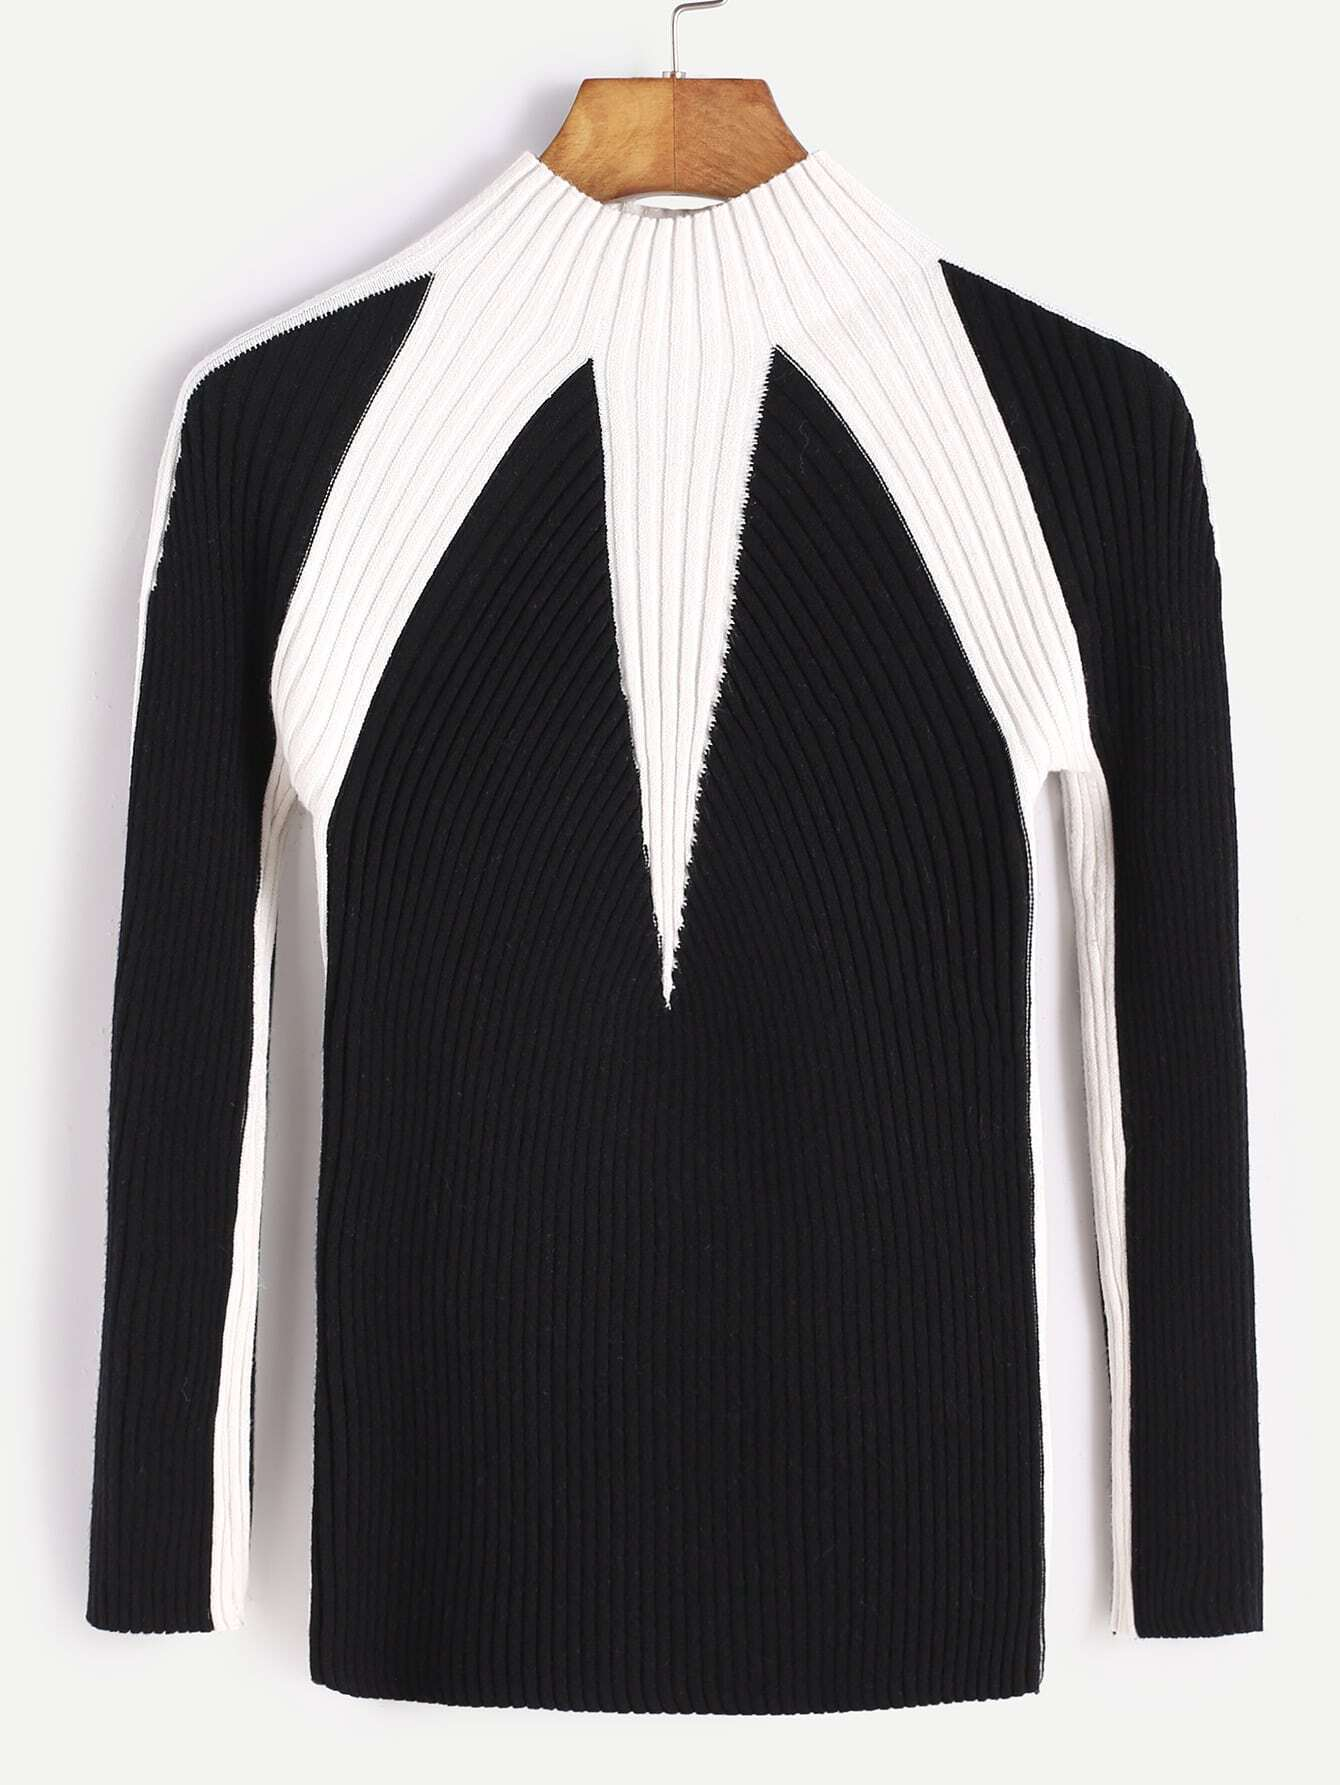 Black Contrast Mock Neck Ribbed Knit Sweater